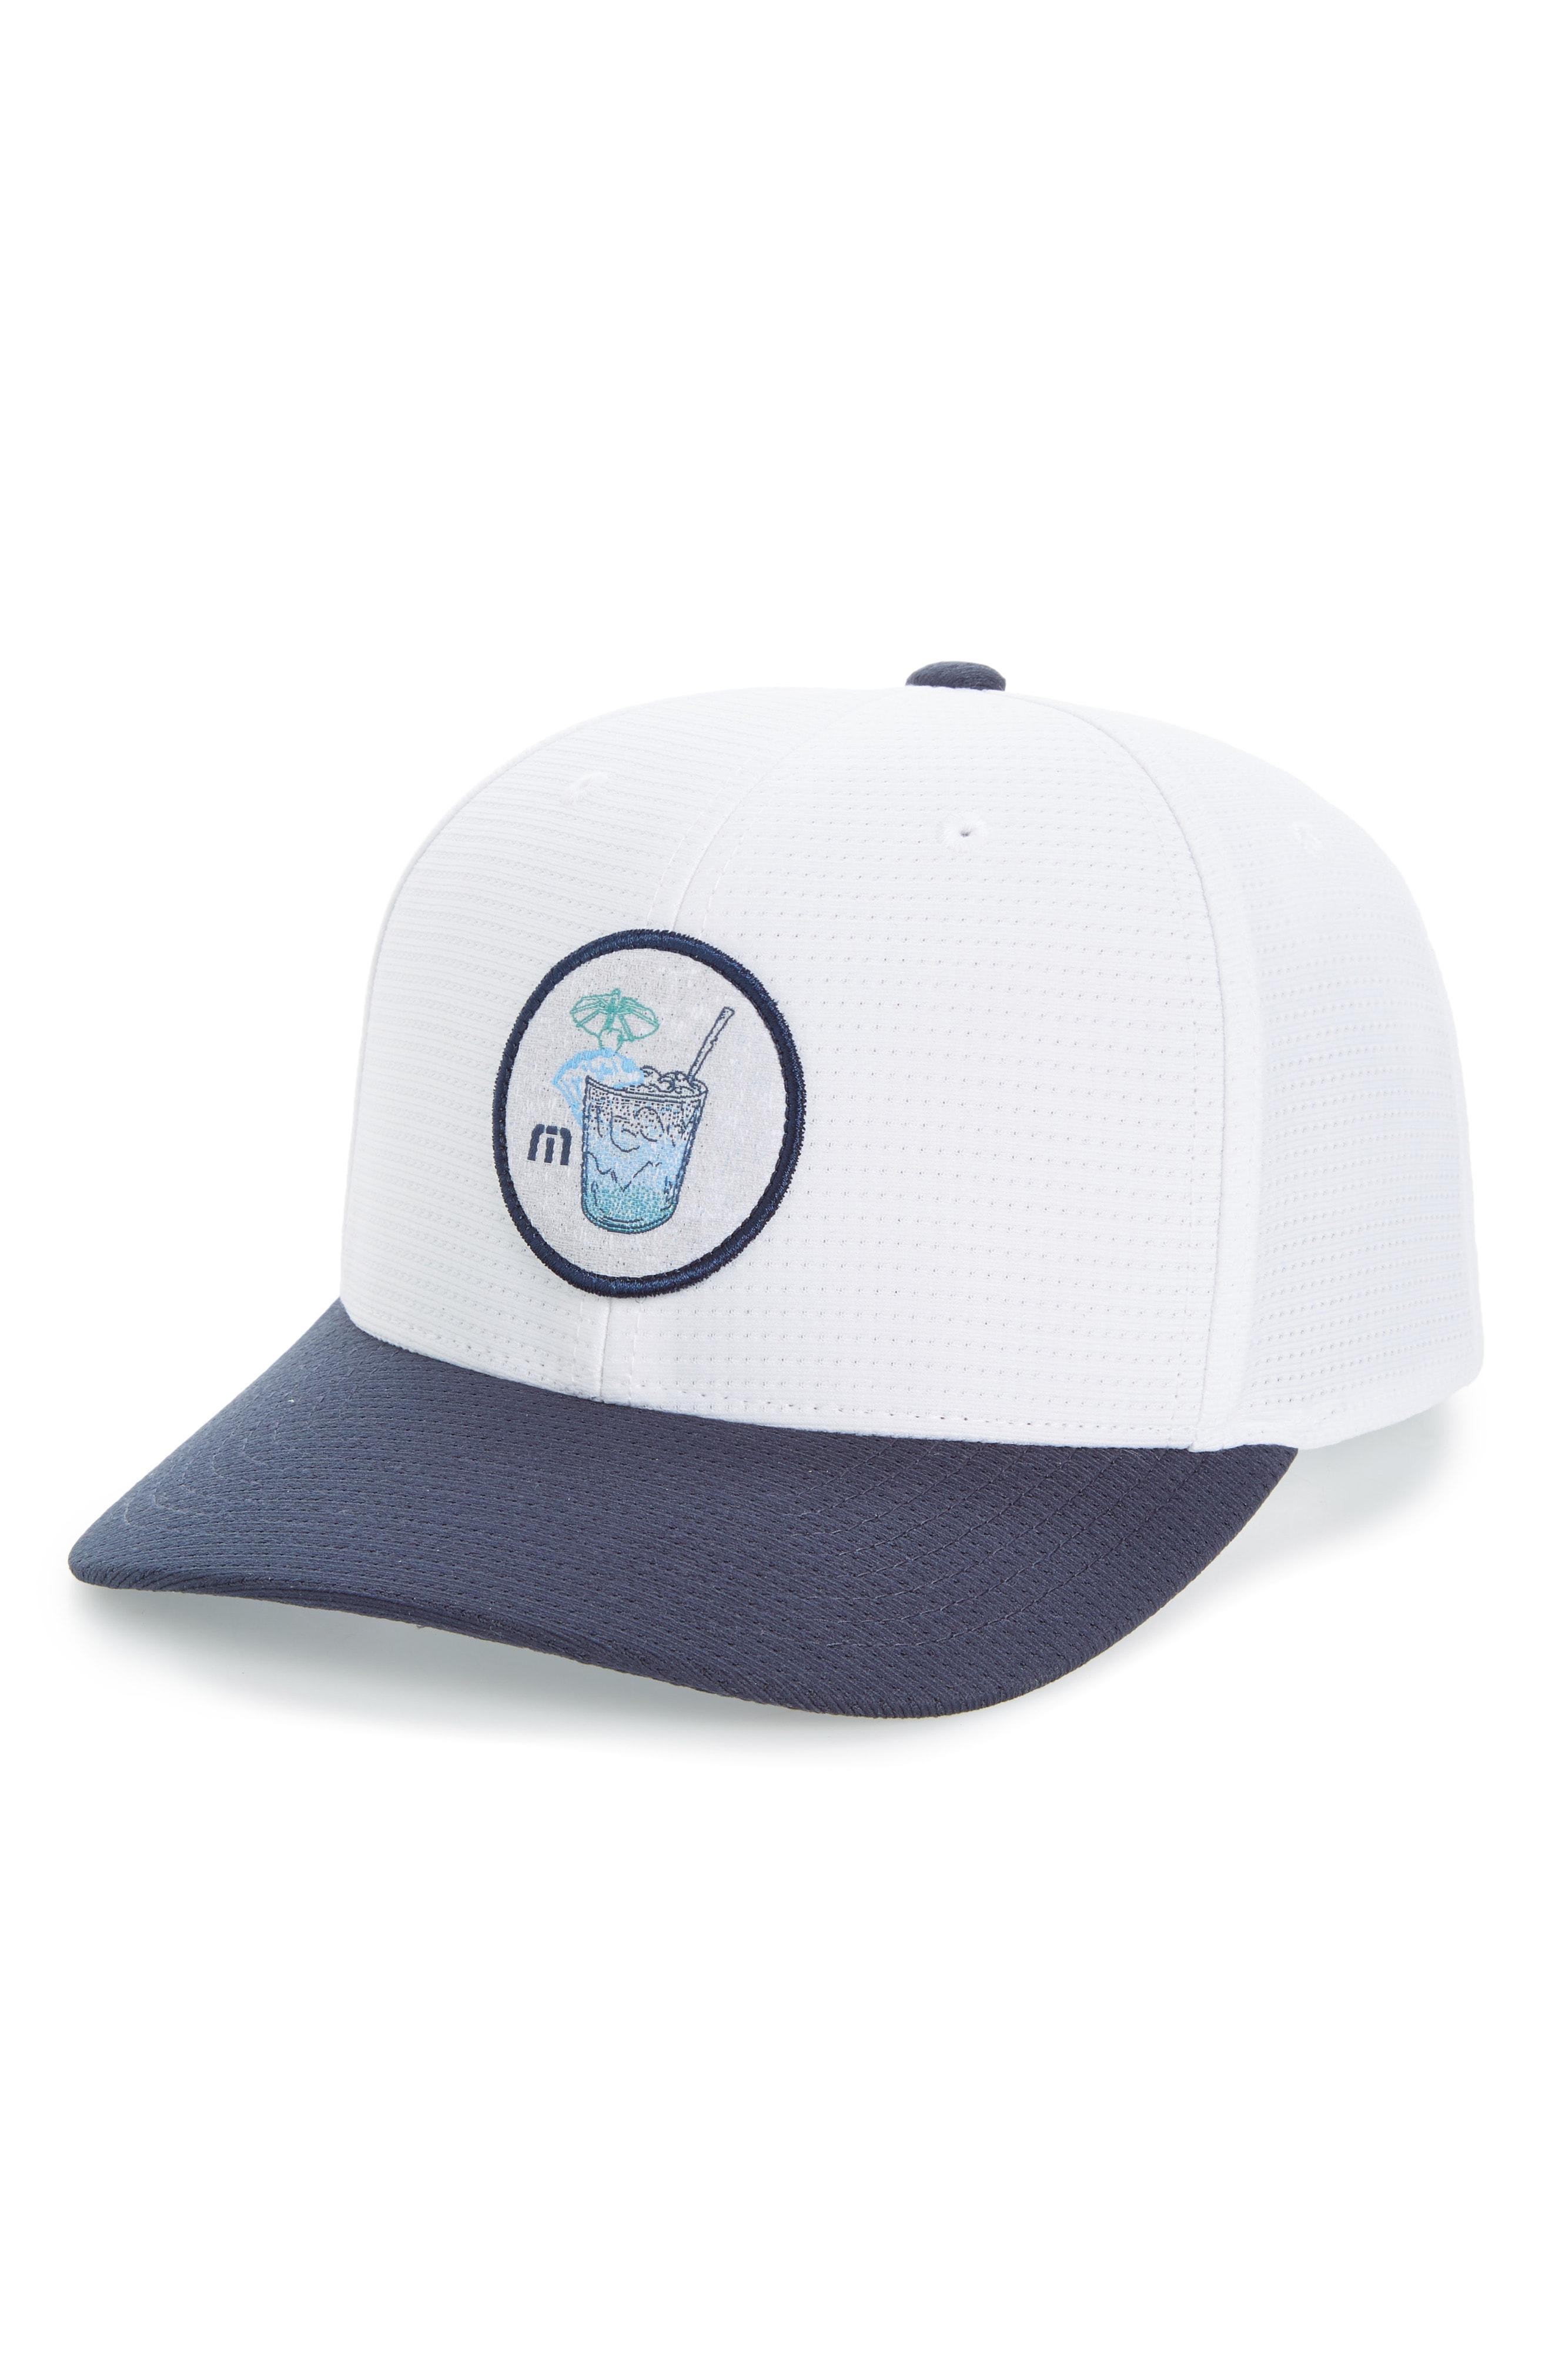 Lyst - Travis Mathew Sunday Logo Patch Cap in White for Men 8b2eb976123d